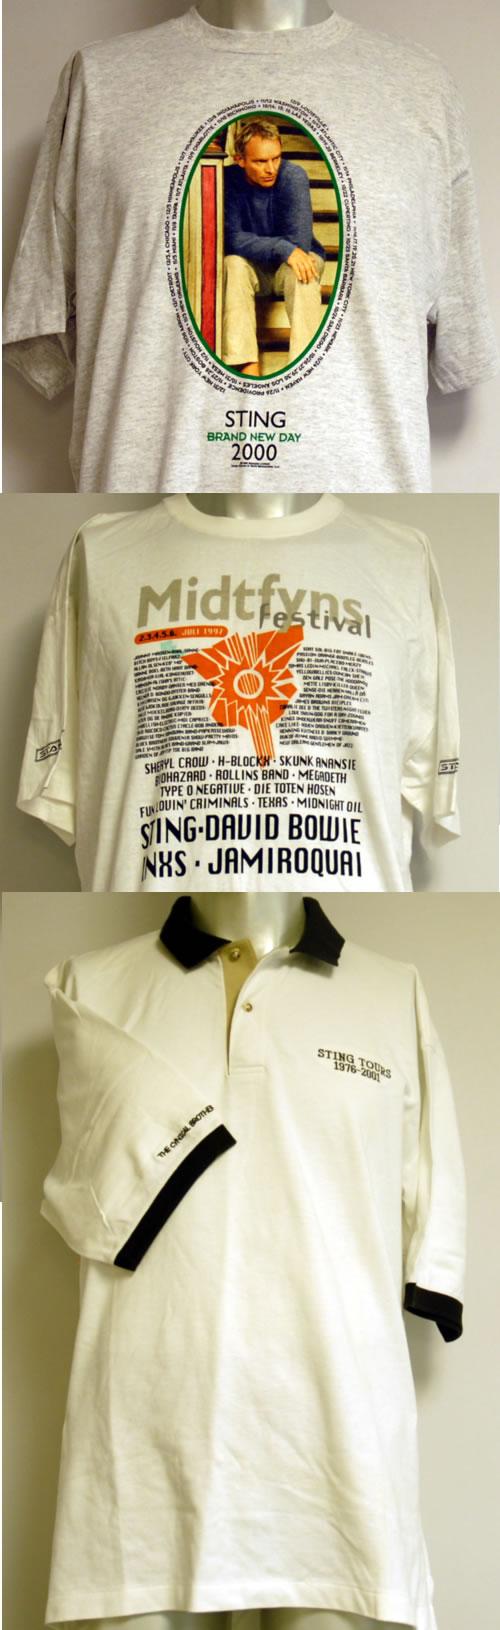 CHEAP Sting Crew & Tour T-Shirts UK t-shirt 10STINGCREWSHIRTS 25209850551 – General Clothing